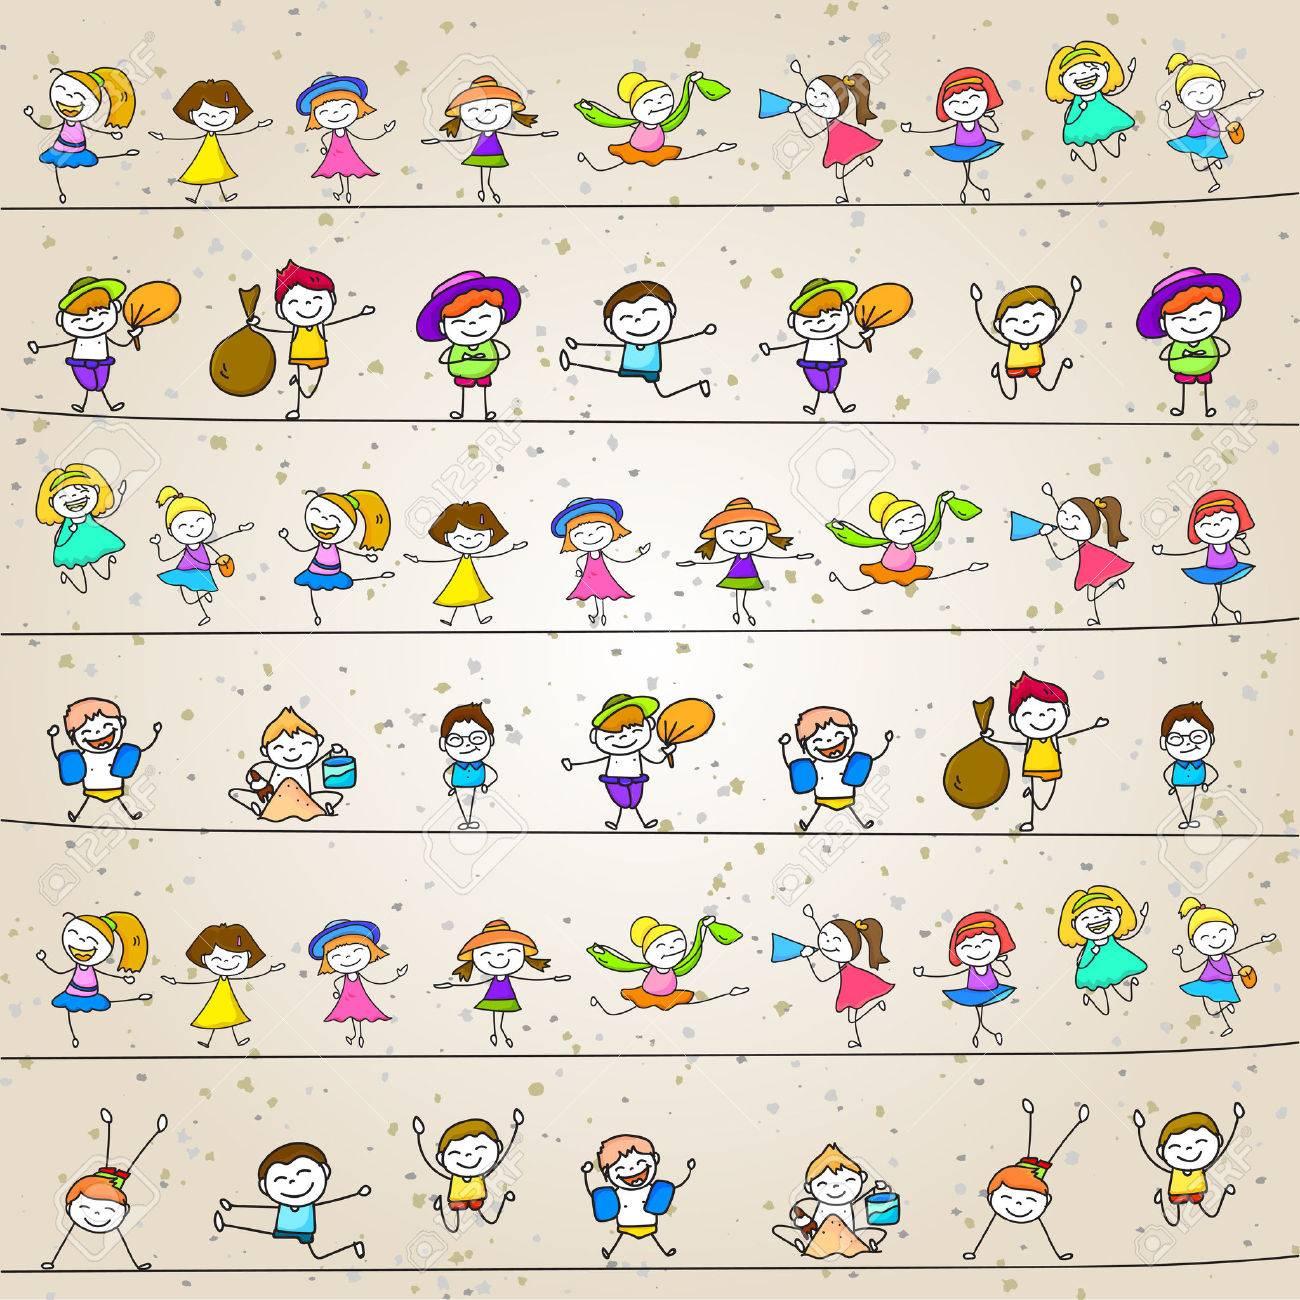 hand drawing cartoon character happy kids playing - 42663718